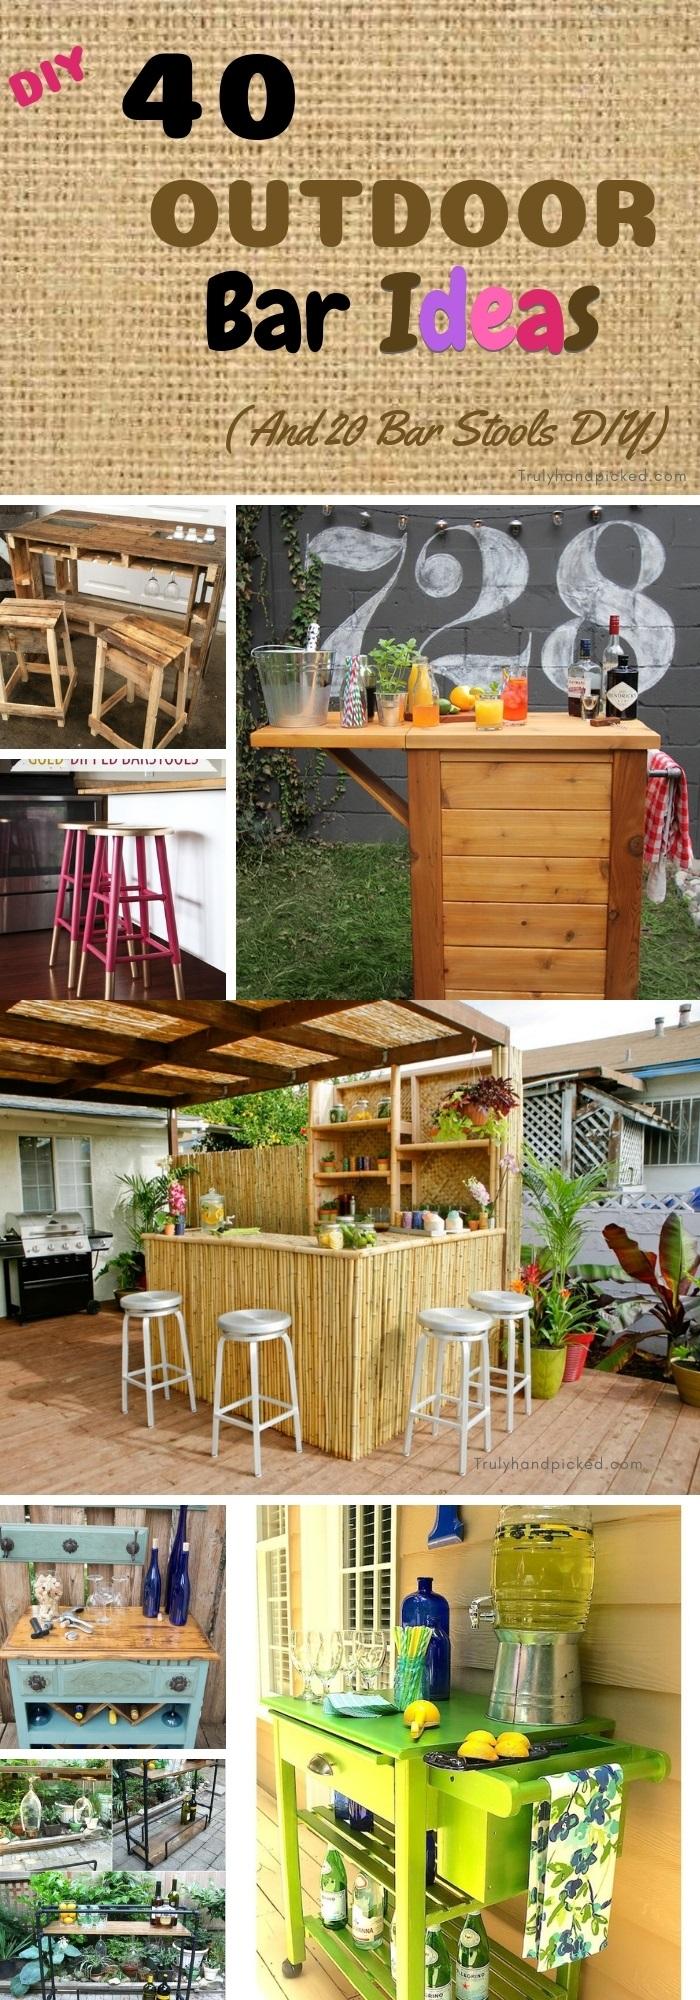 40 Diy Outdoor Bar Ideas Inexpensive, How To Make An Outdoor Bar Table